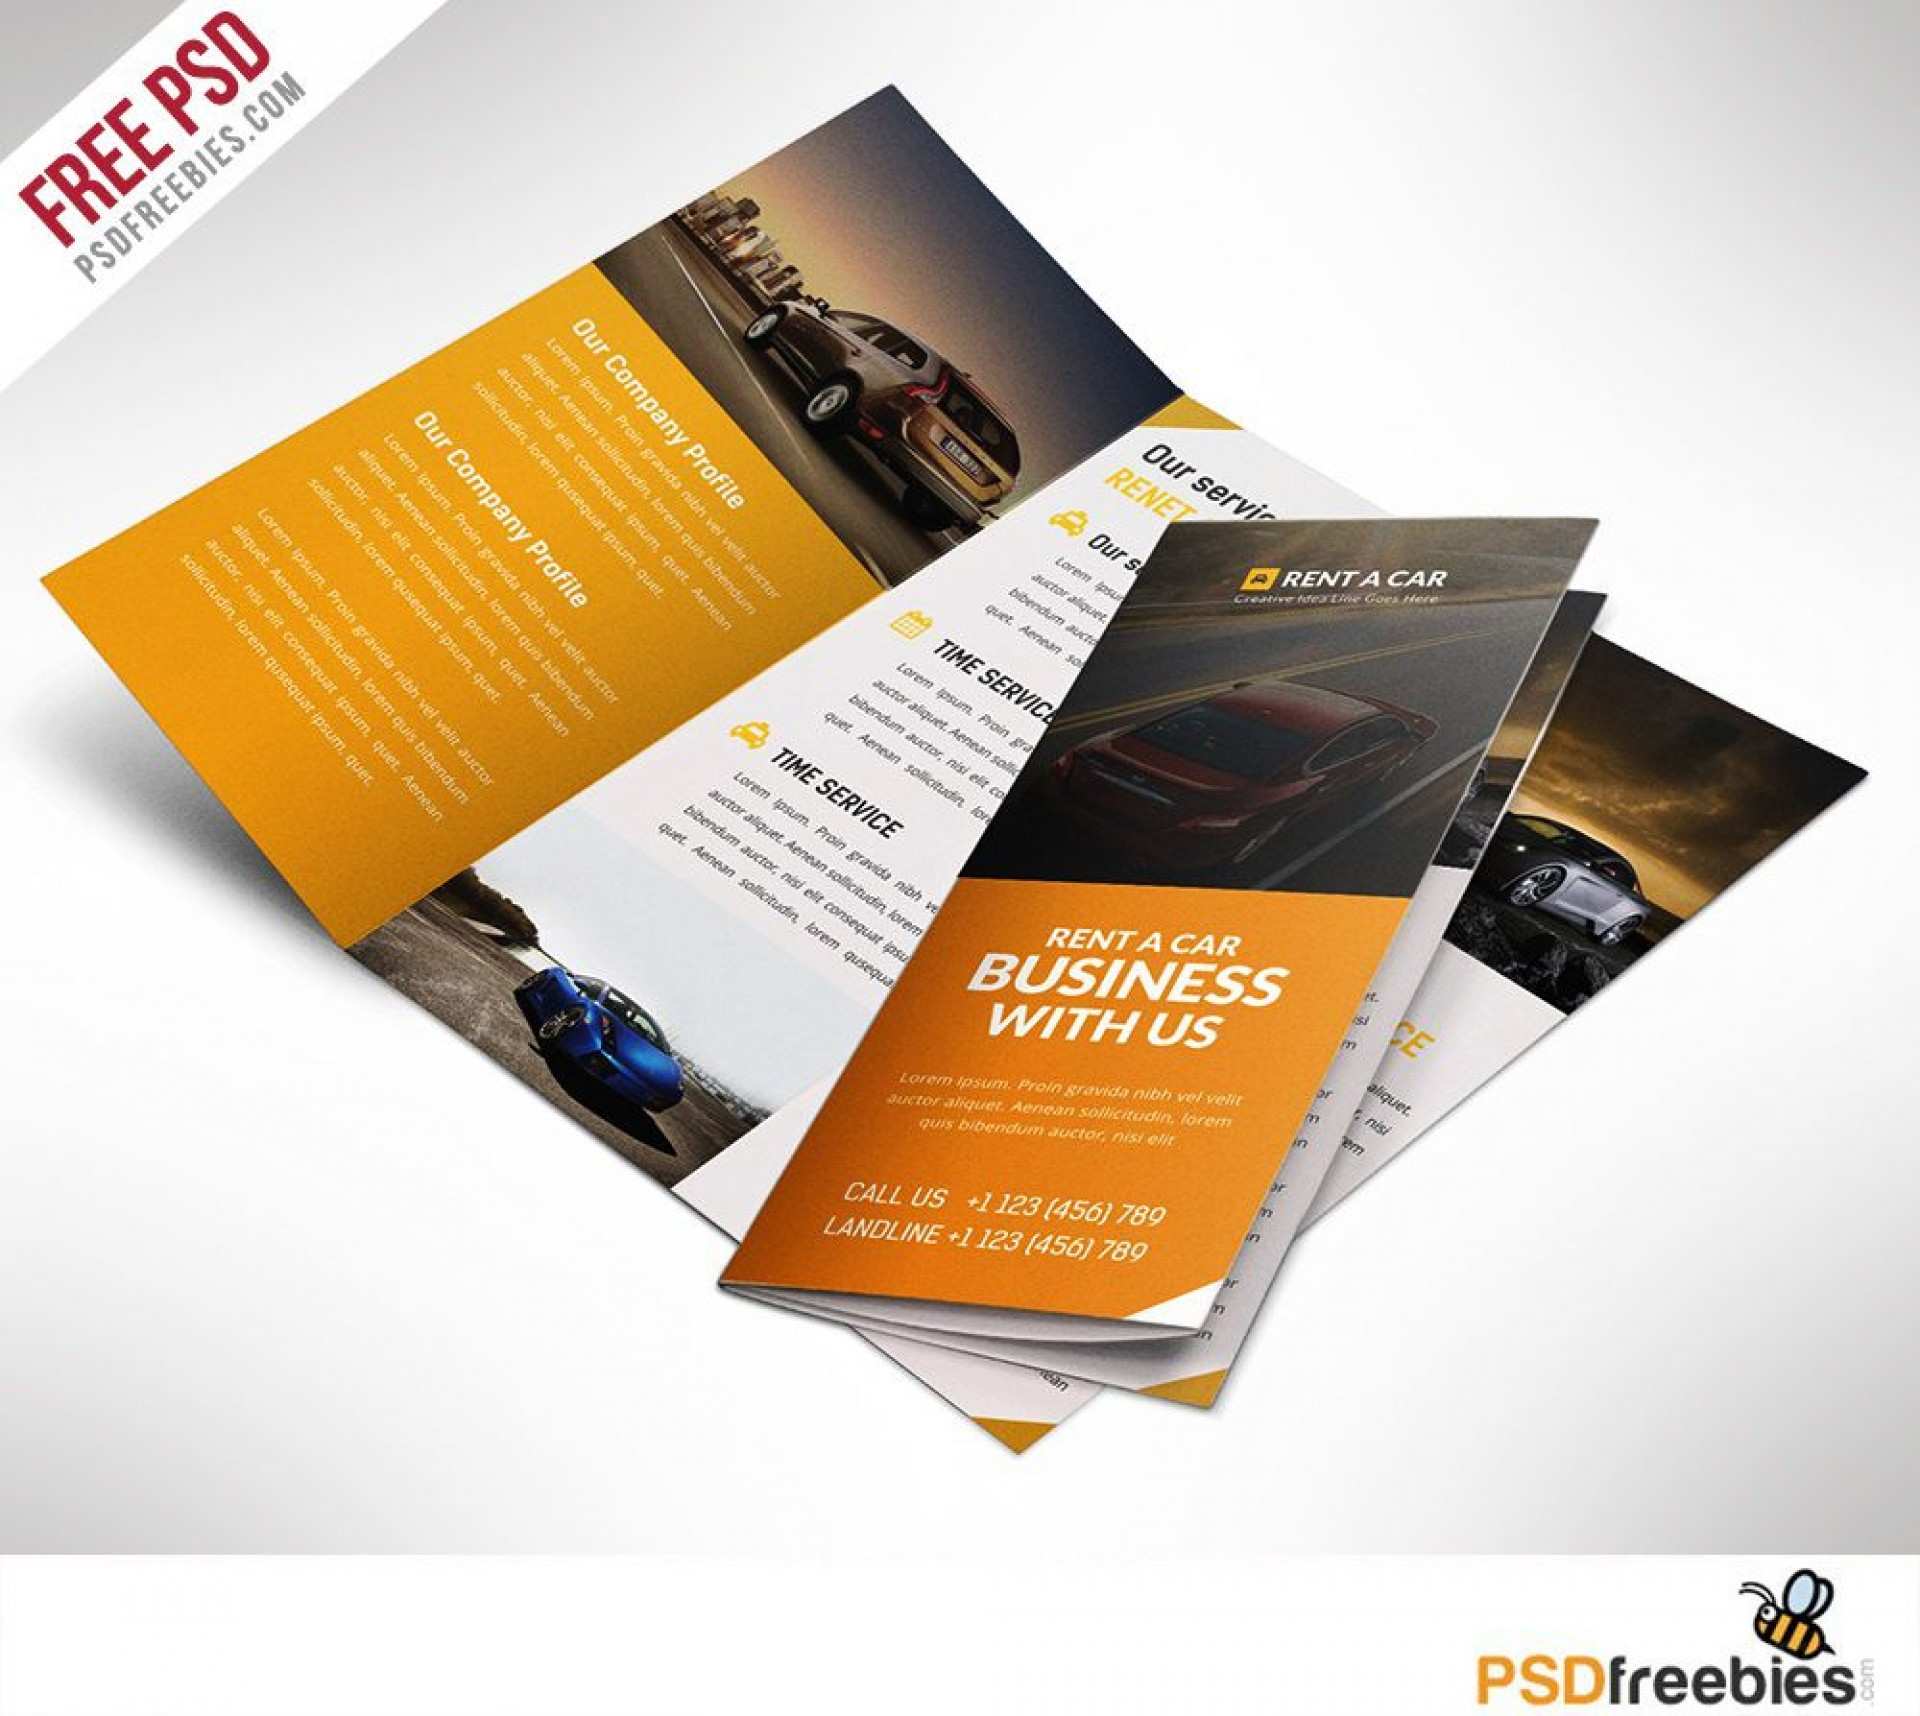 003 Wonderful Corporate Brochure Design Template Psd Free Download High Resolution  Tri Fold Hotel1920